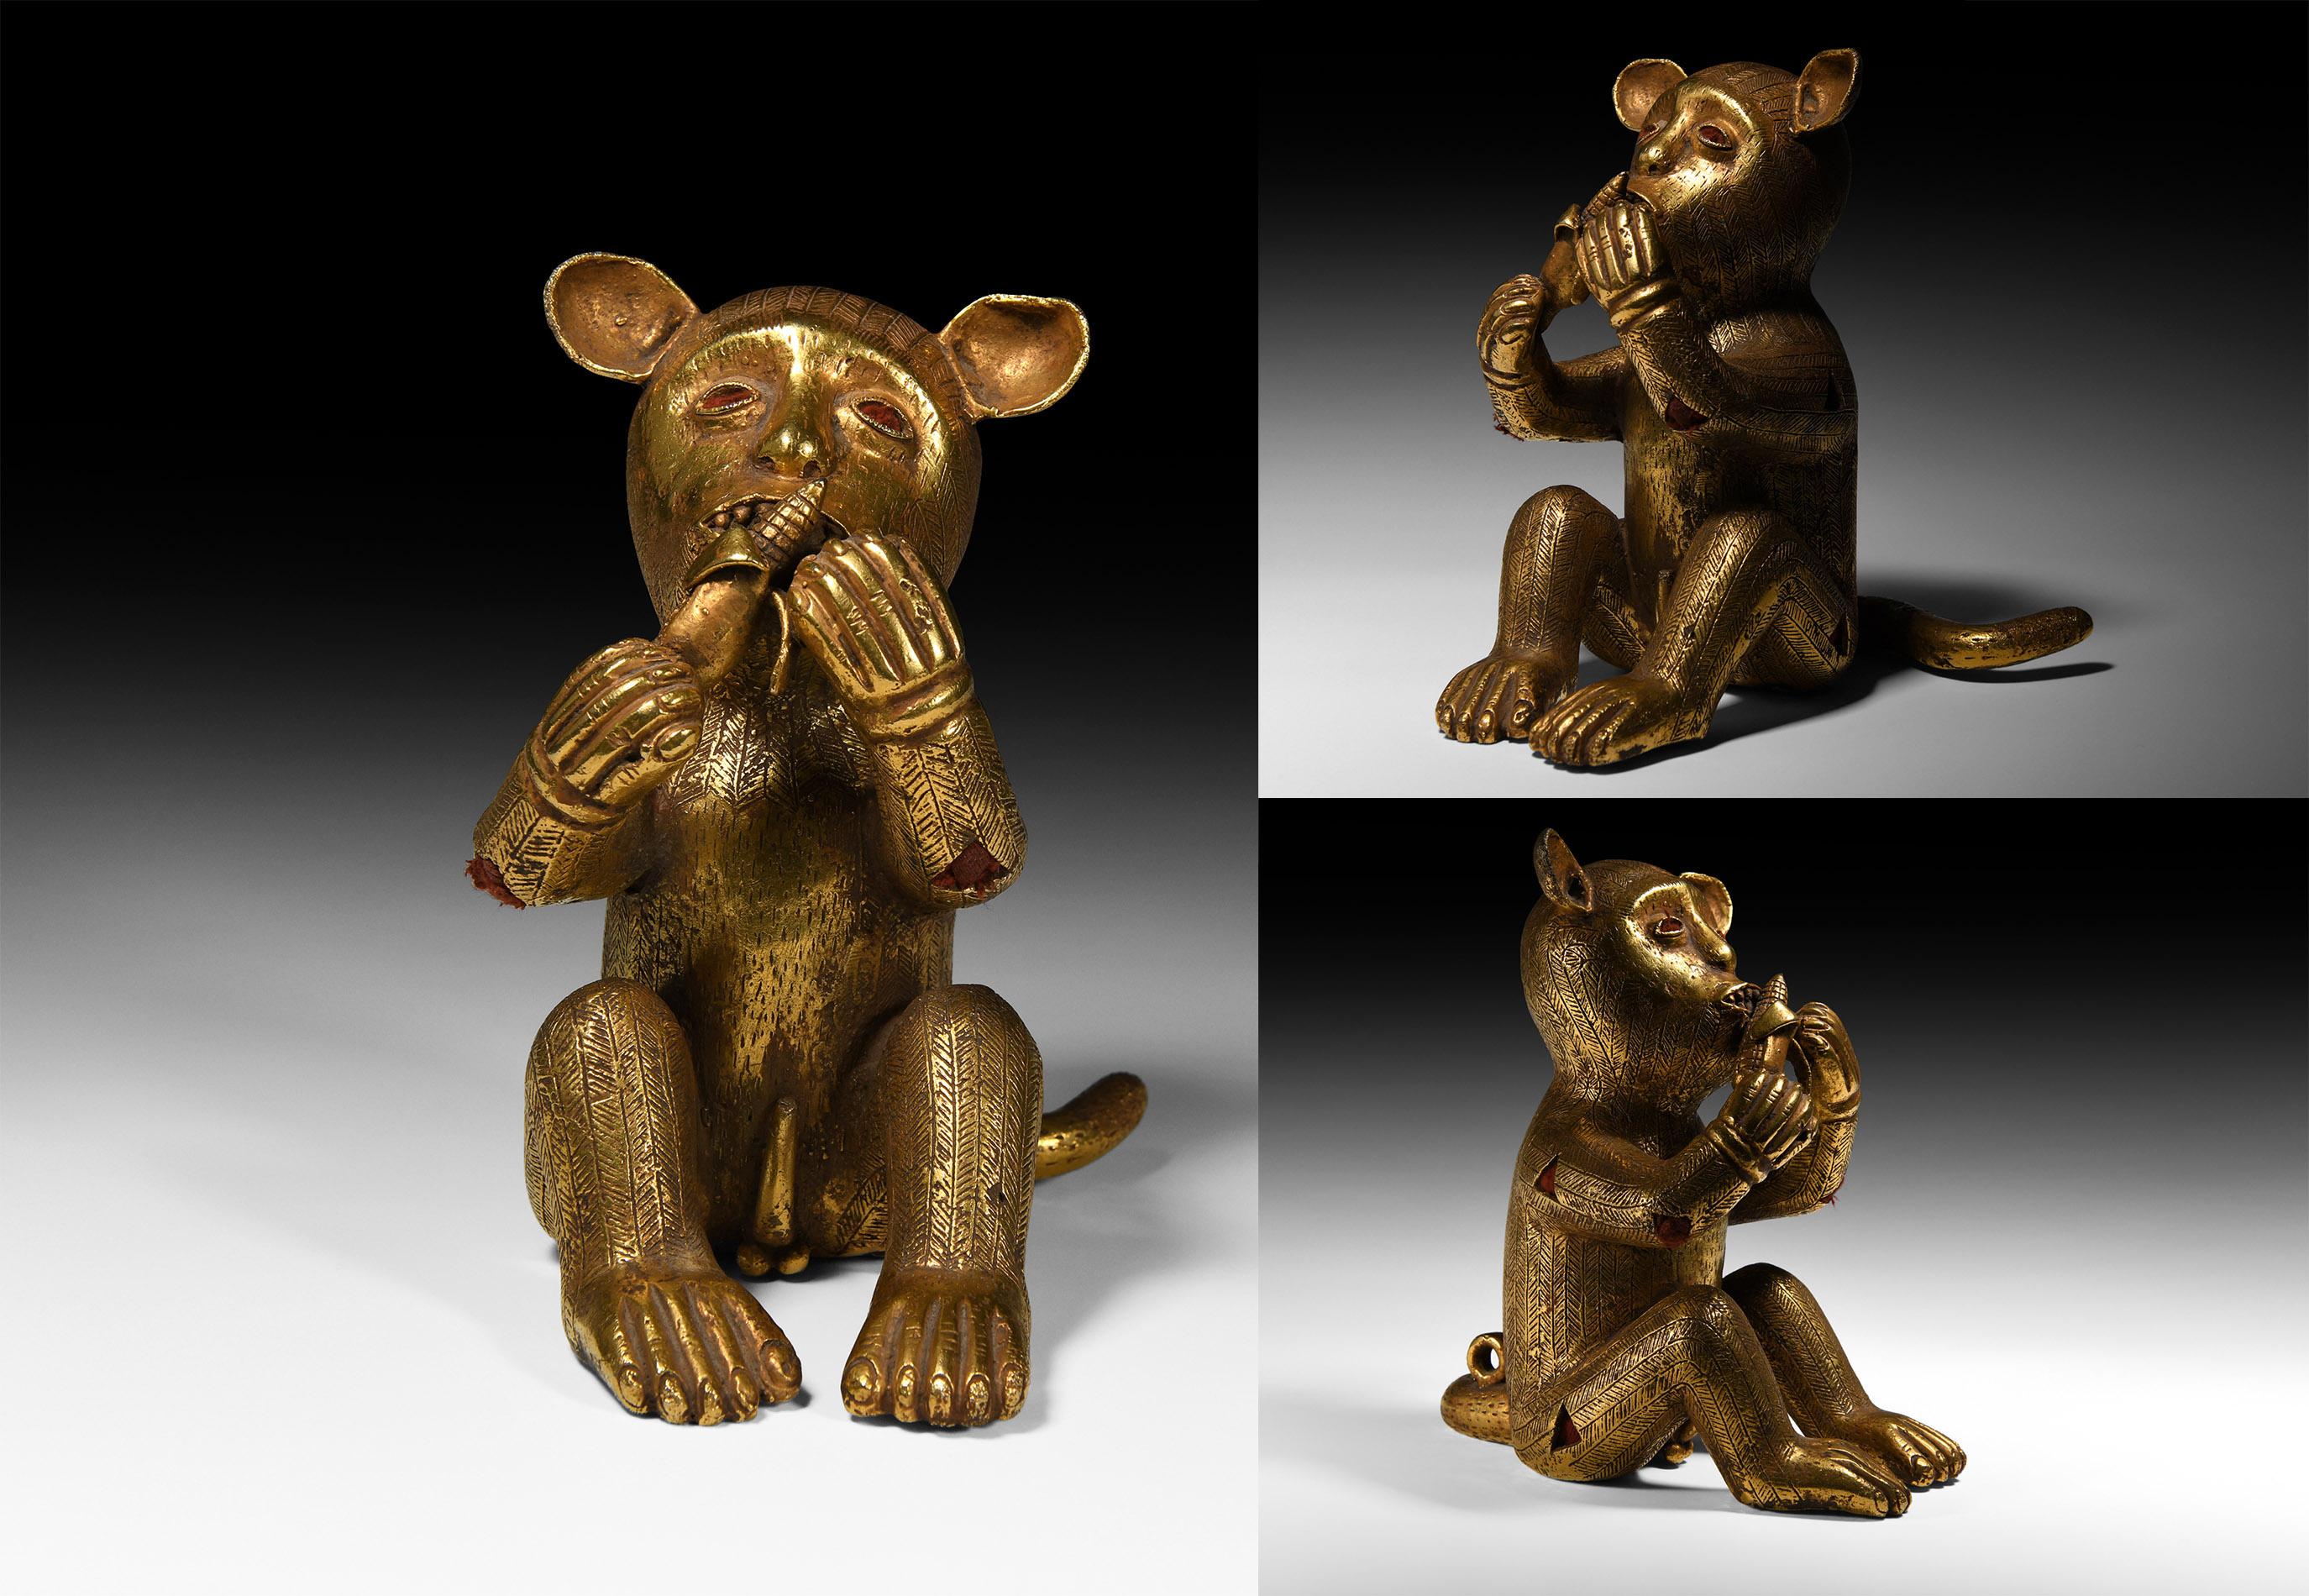 Lot 550 - Asante Gilt Seated Baboon Sword Ornament